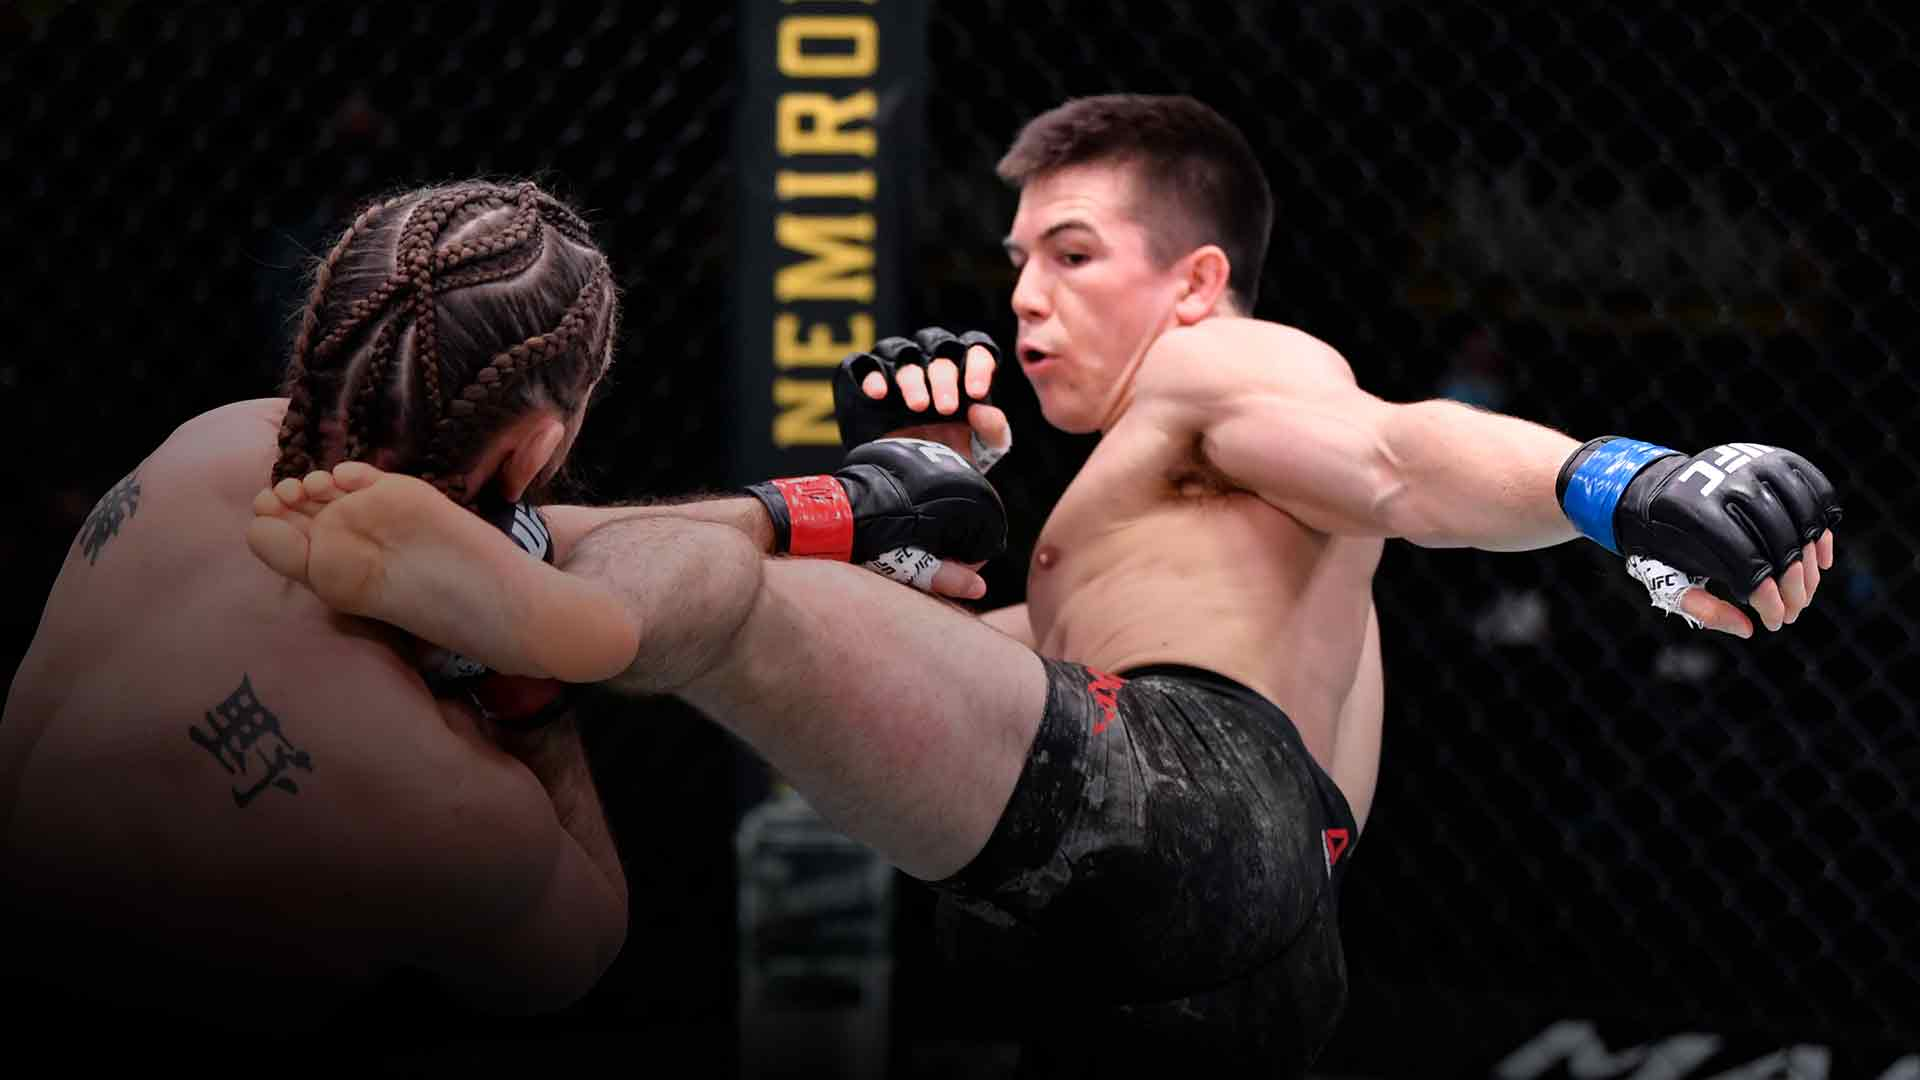 Alexander Hernandez kicks Chris Gruetzemacher in a lightweight bout during the UFC Fight Night event at UFC APEX on October 31, 2020 in Las Vegas, Nevada. (Photo by Jeff Bottari/Zuffa LLC)